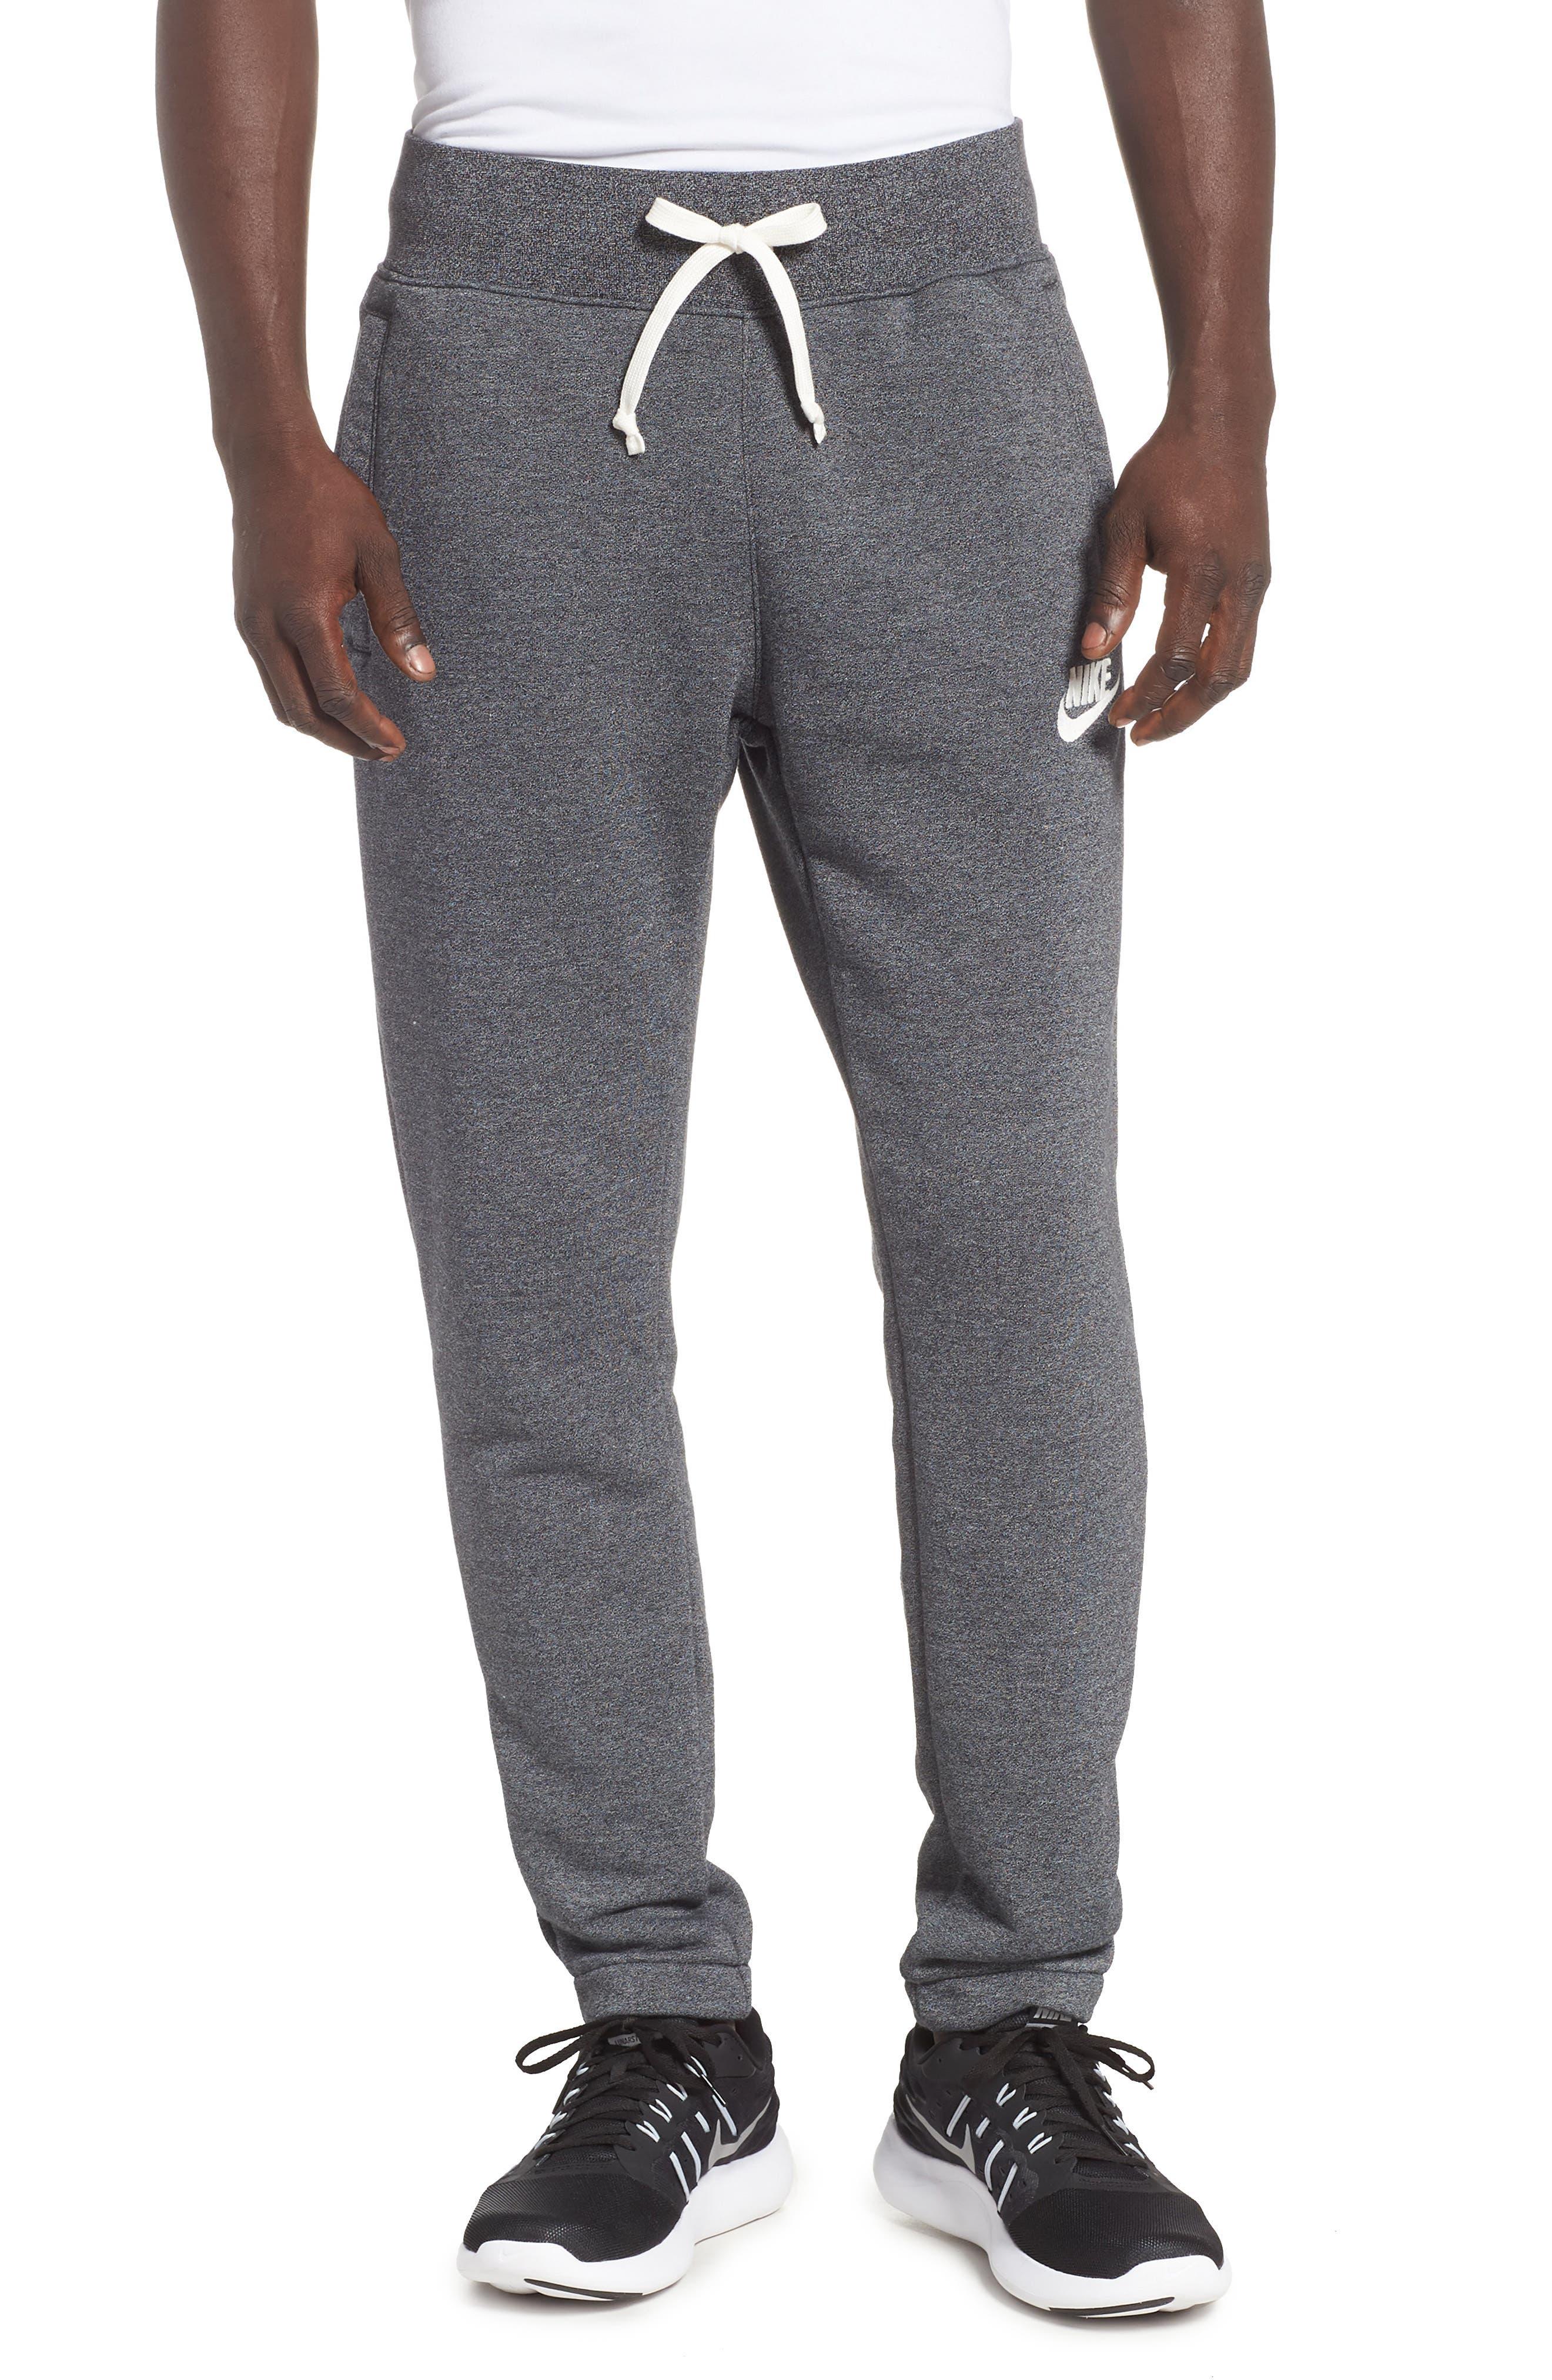 Sportswear ACG Heritage Pants,                         Main,                         color, BLACK/ HTR/ SAIL